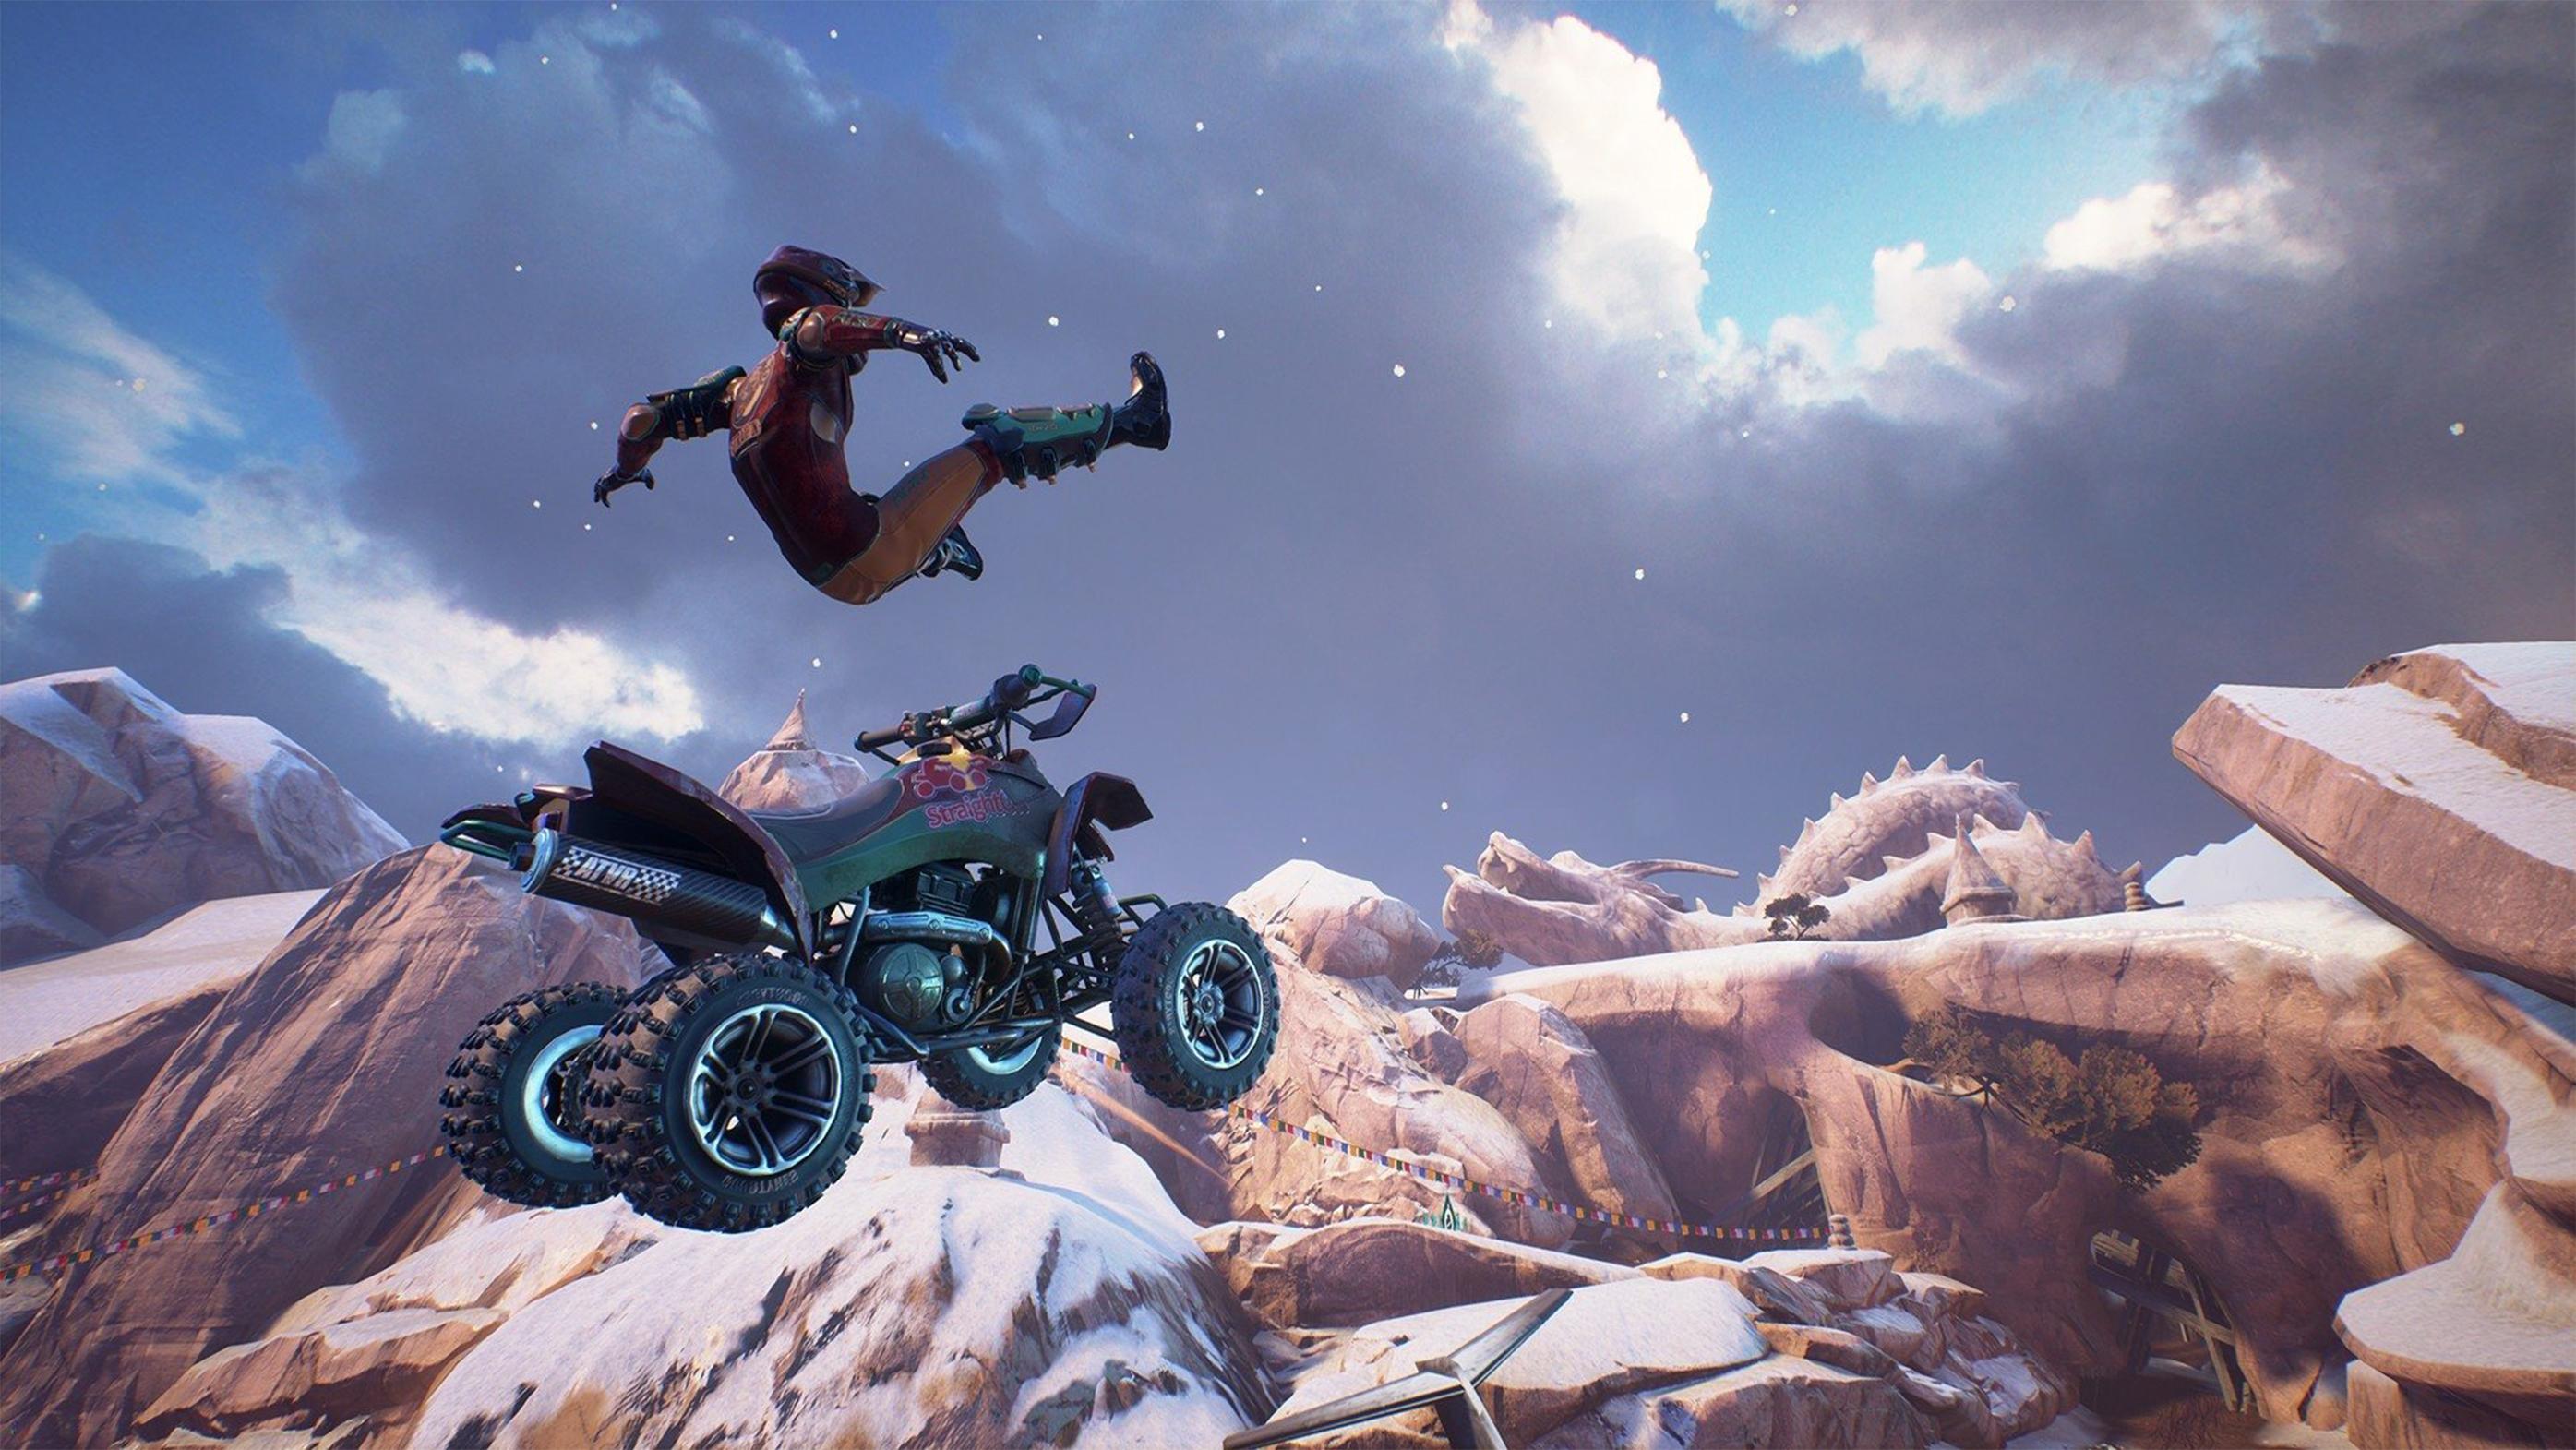 guy flying off his ATV